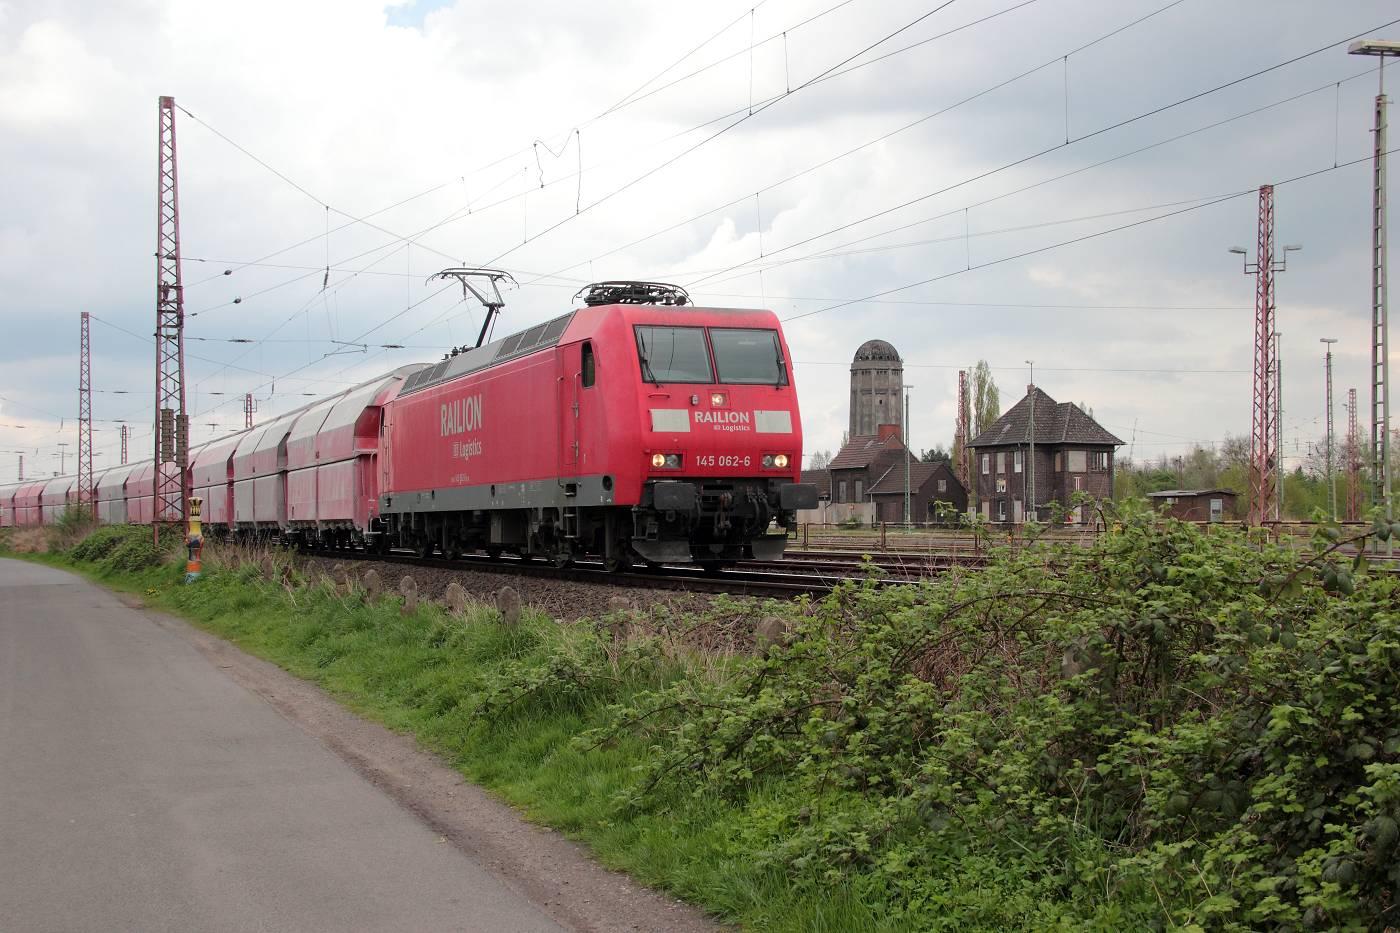 http://www.nachtbahner.de/fotos/2014-04-11%20Hochbetrieb%20in%20HB-Mahndorf/k-IMG_2814%20Mahndorfer%20Raps%20%2810%29.JPG